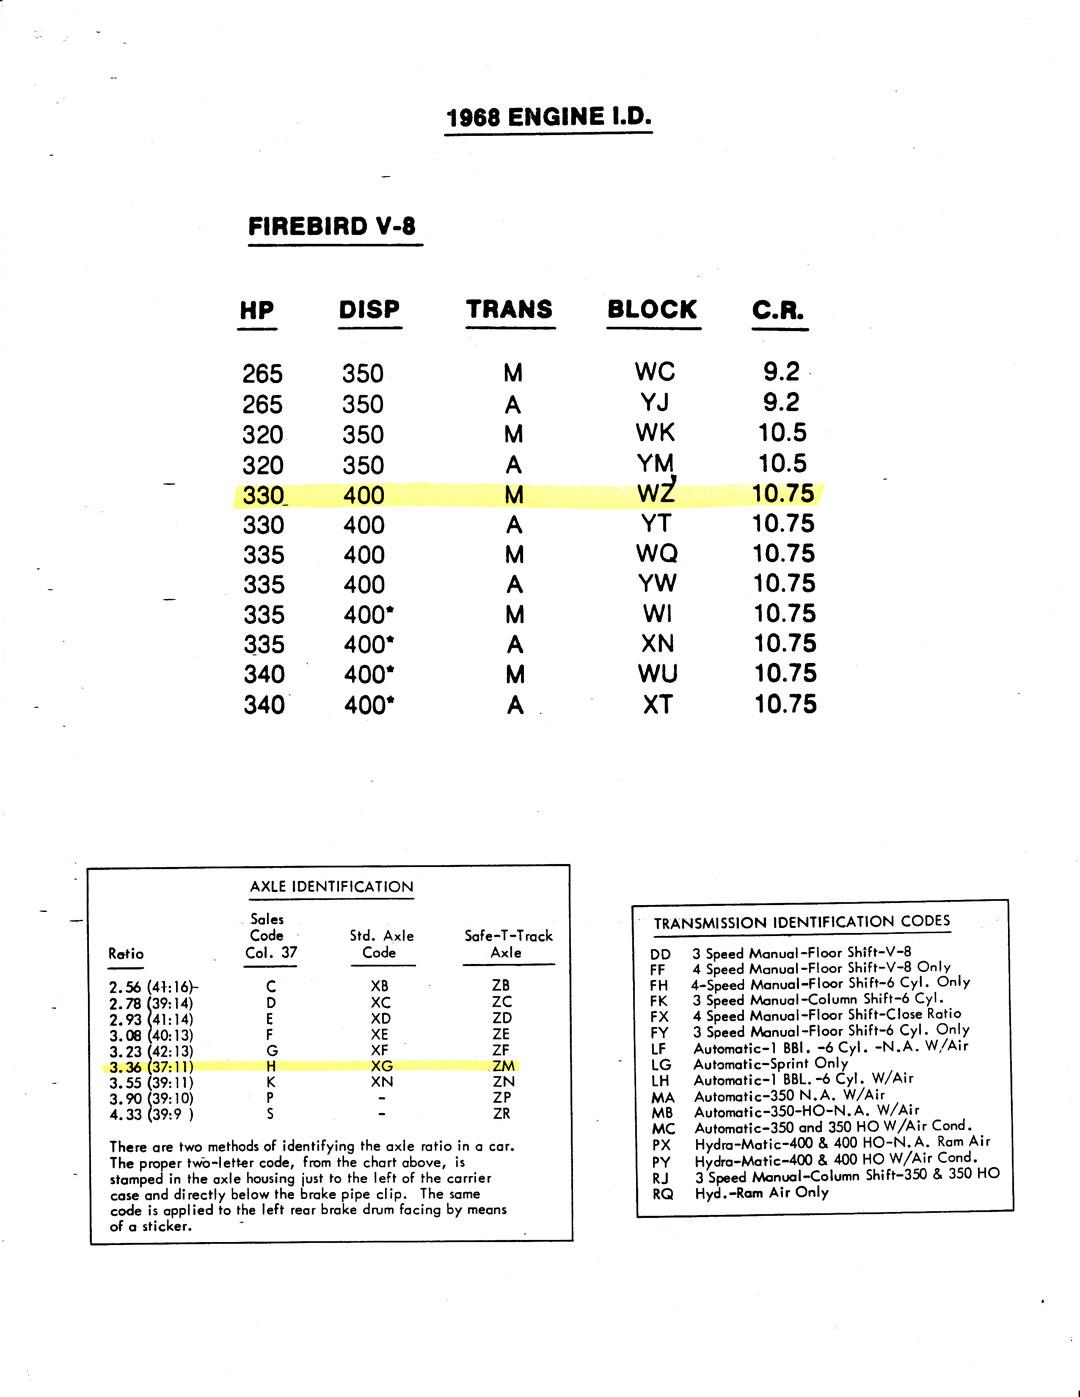 Pontiac Firebird Engine Codes